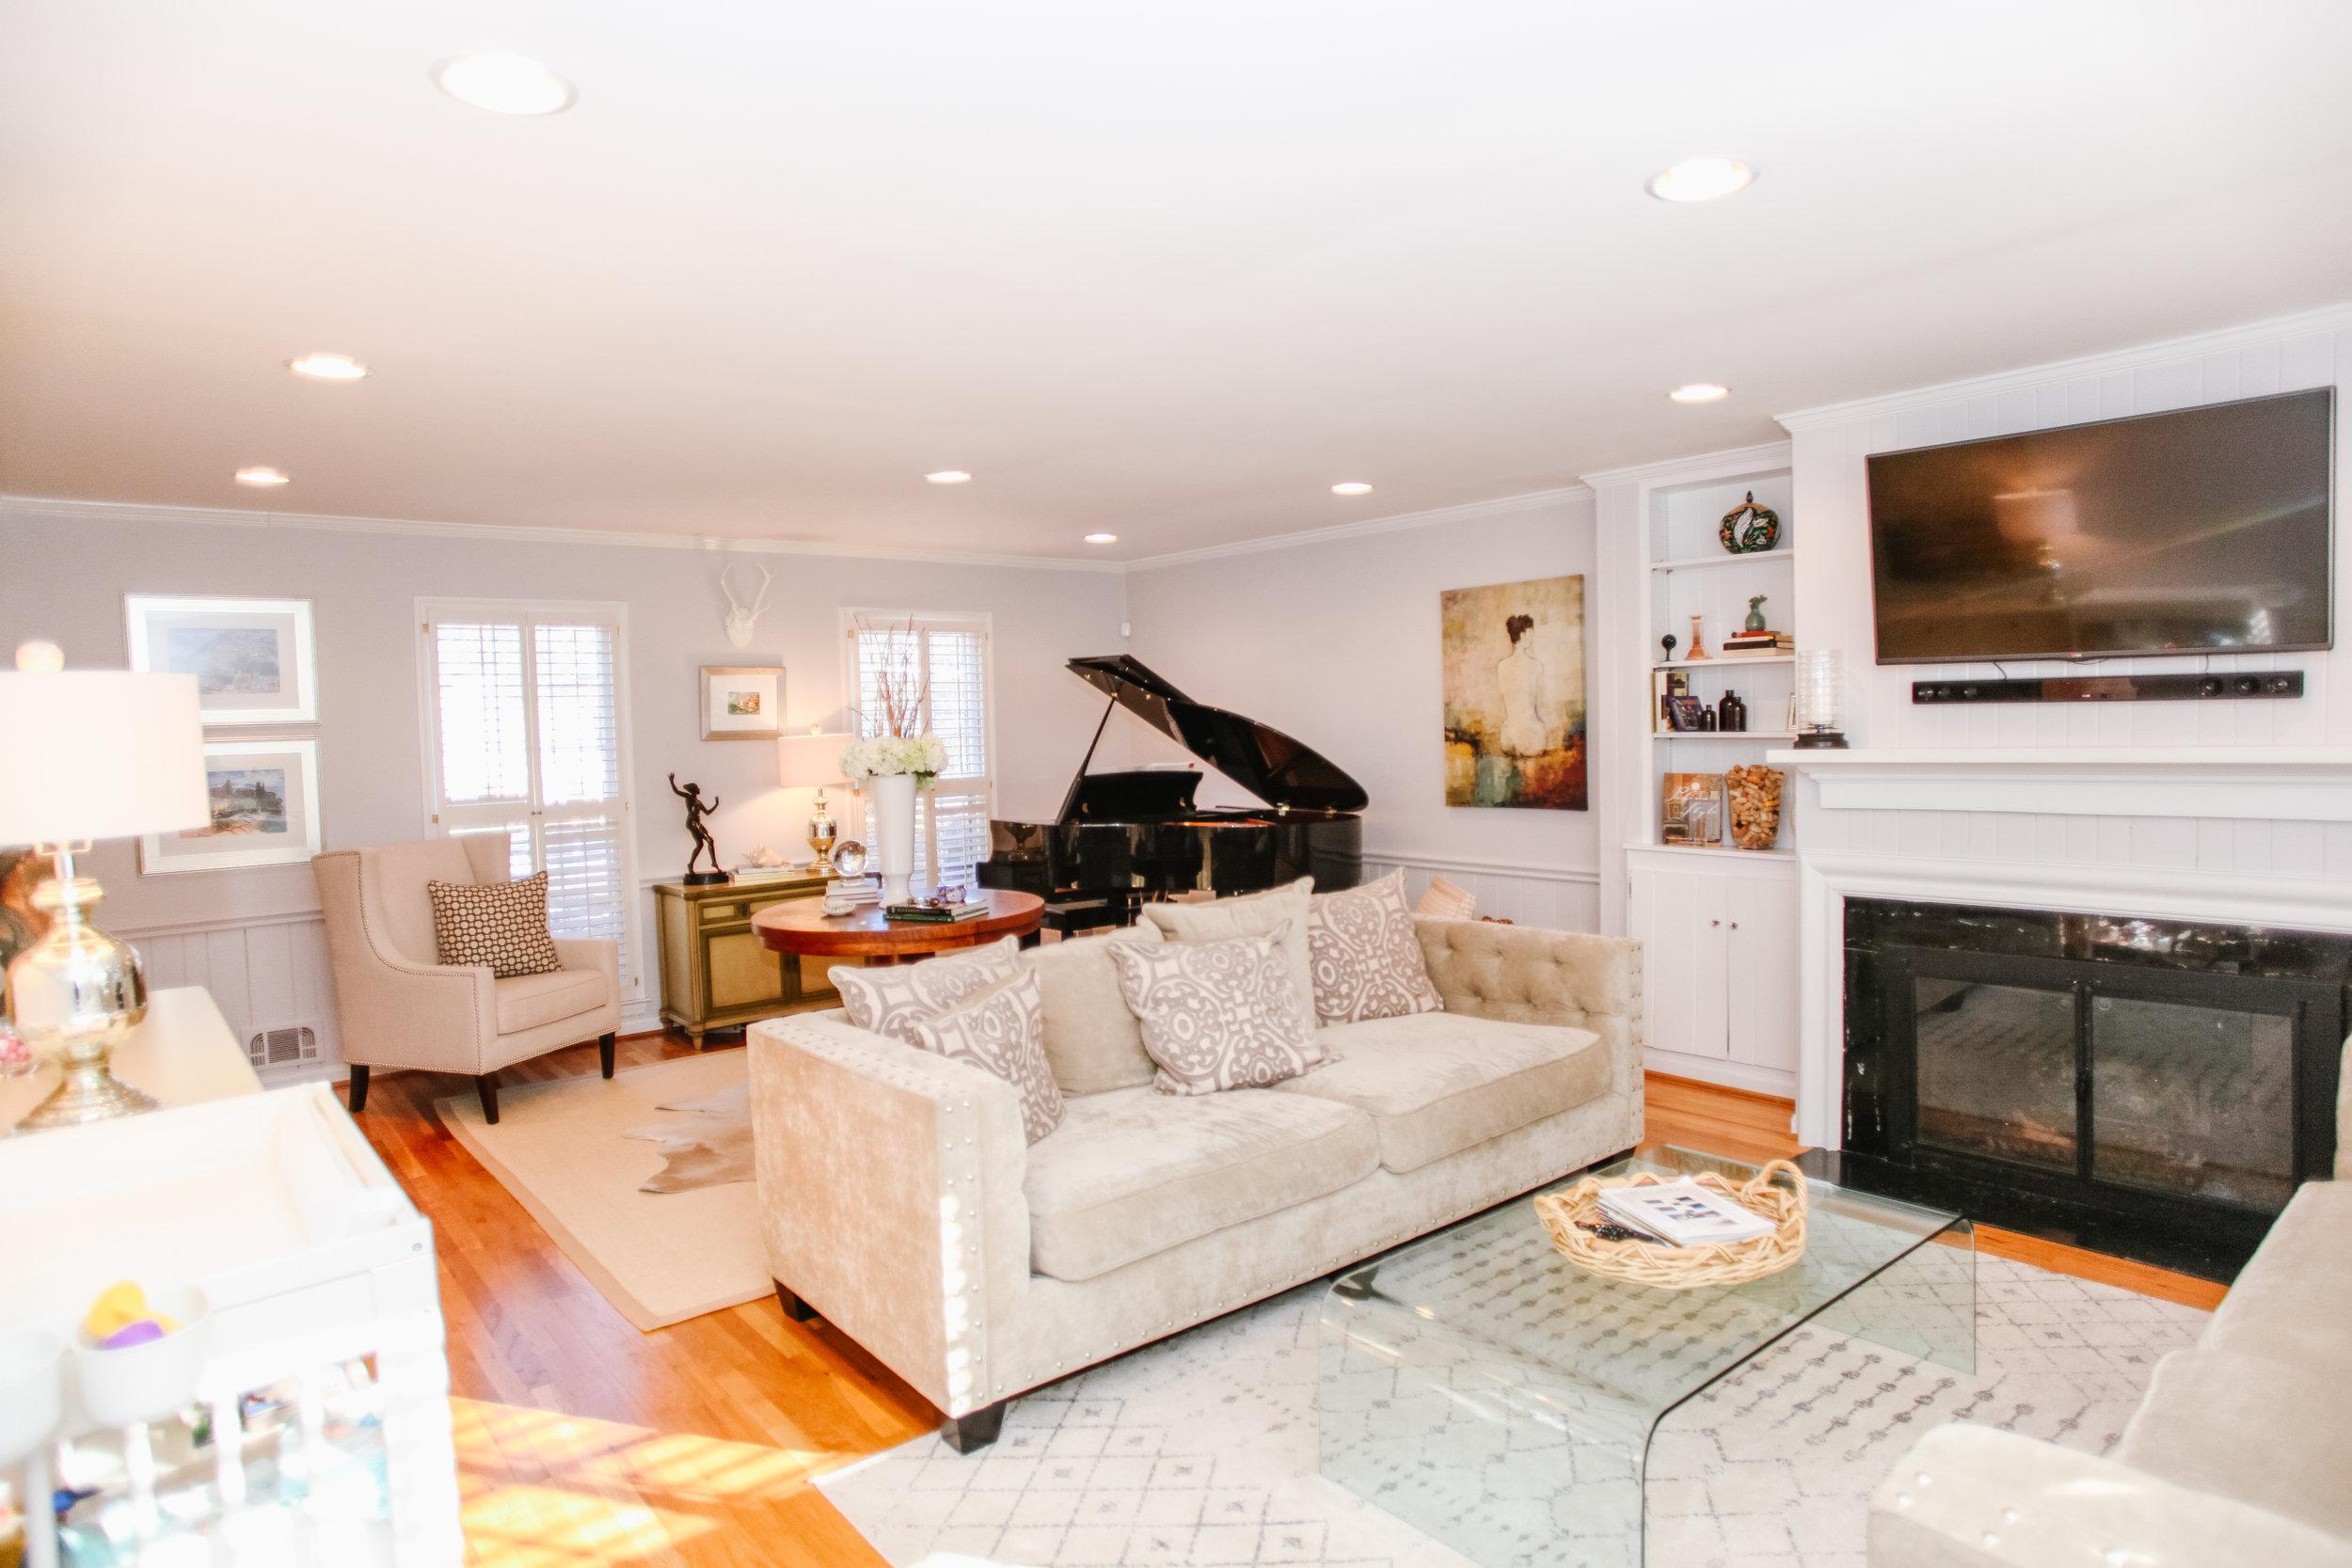 wingard-real-estate-sandy-springs-dream-home-backyard-goals-atlanta-buckhead-34.jpg